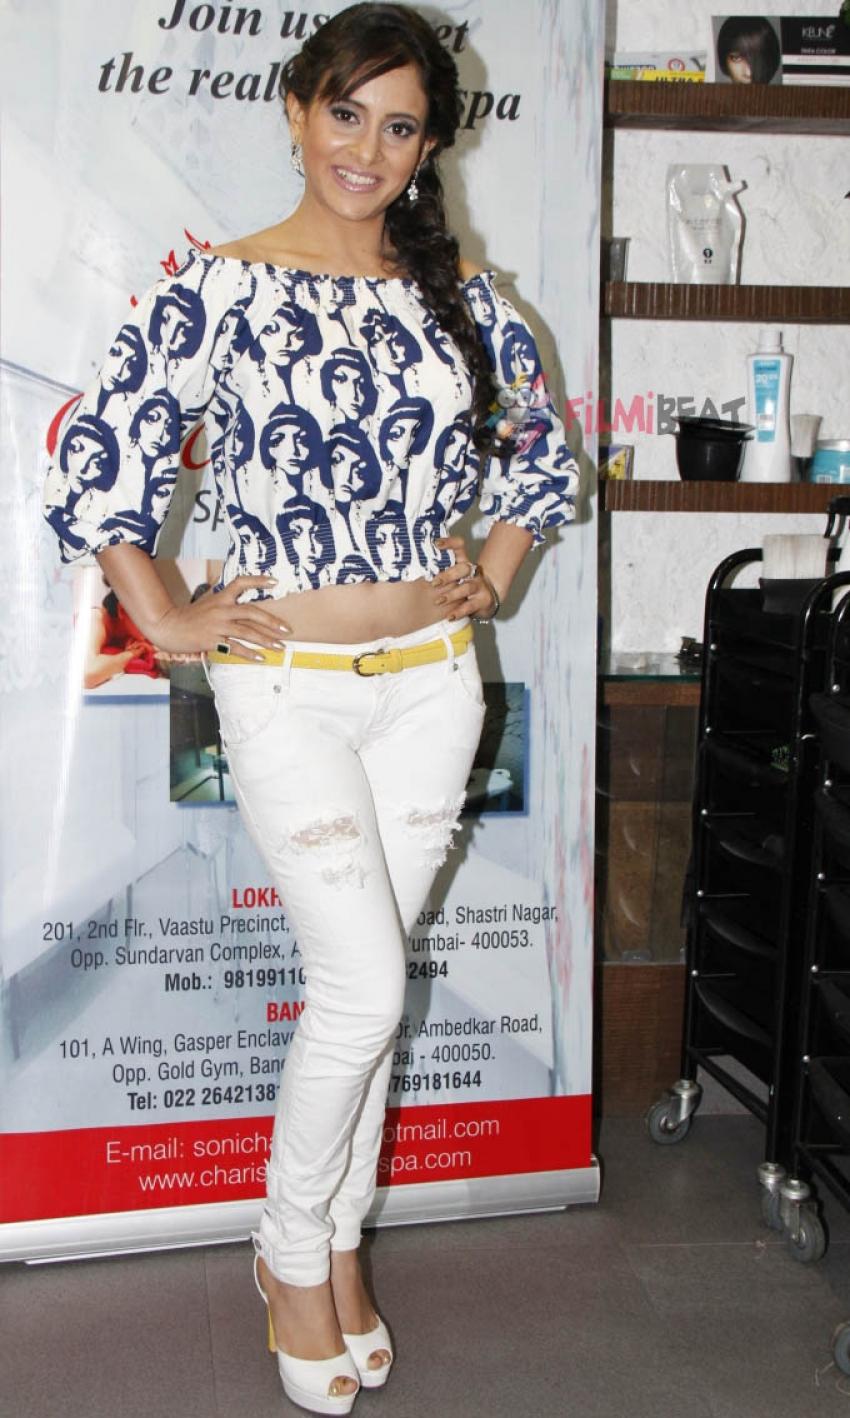 Rakhi Sawant & Other Celebs At The Success Bash Of Charisma Spa Photos